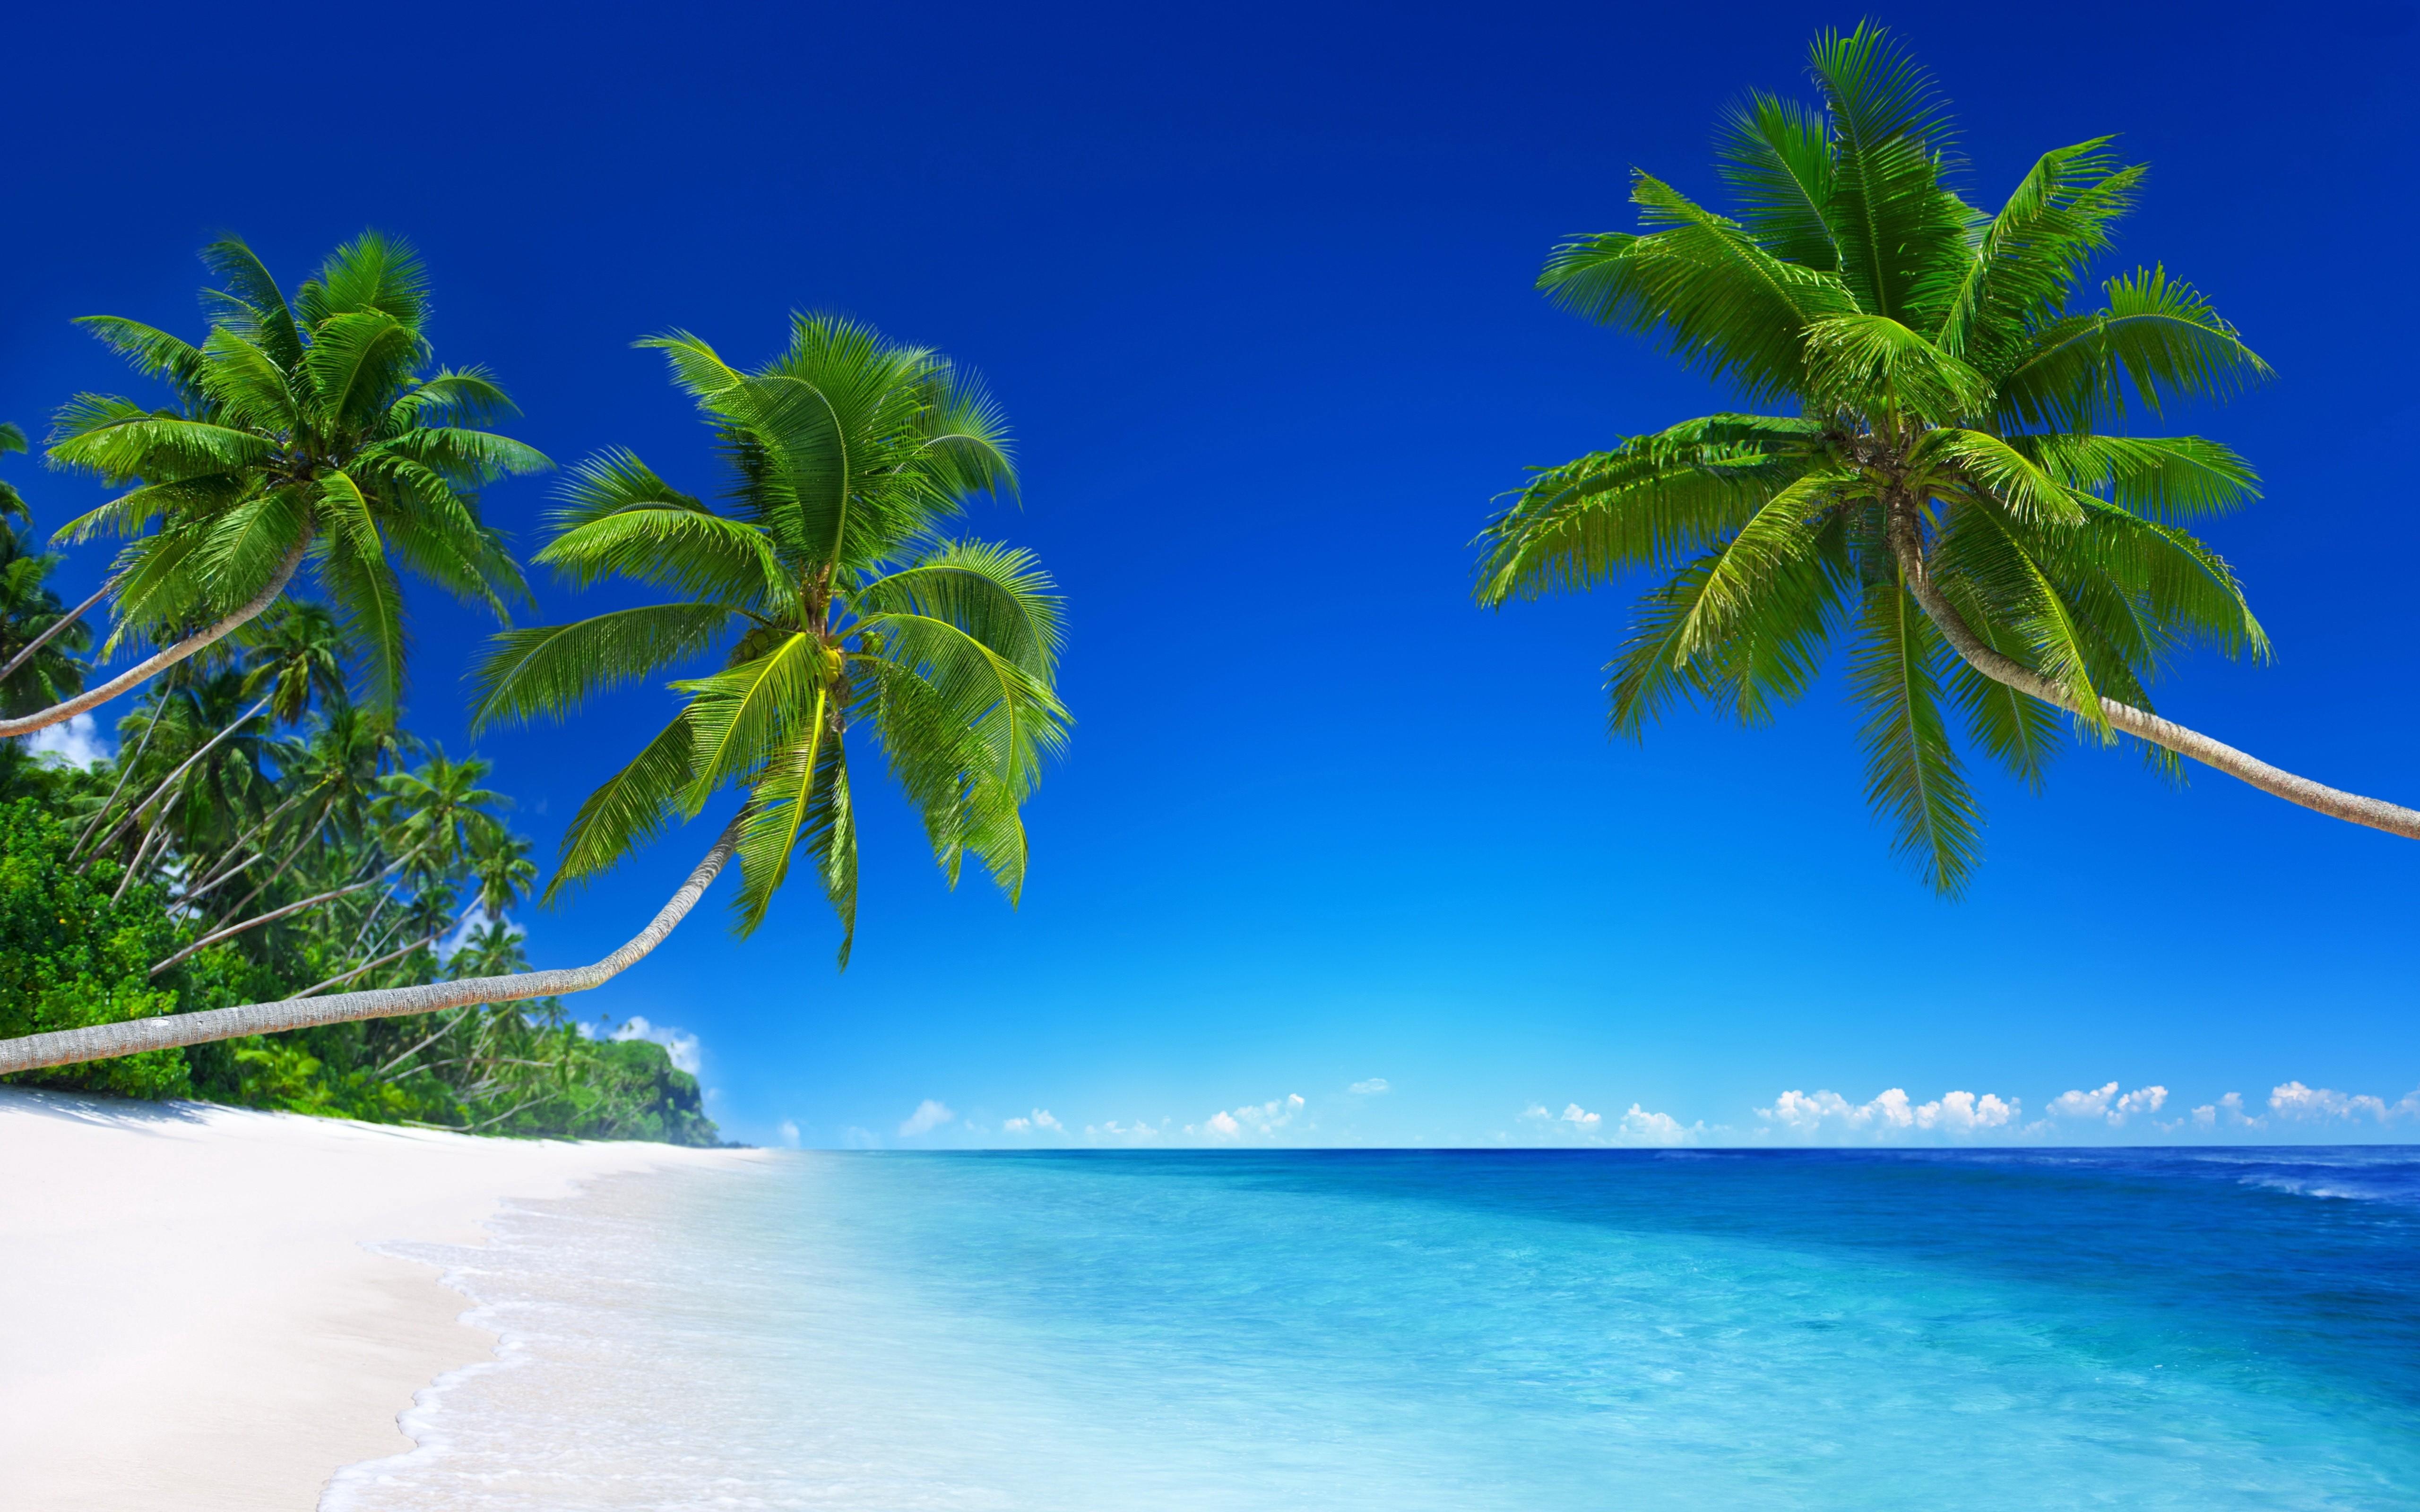 General 5120x3200 beach palm trees sea horizon blue trees water outdoors cyan sky tropical clear sky photo manipulation